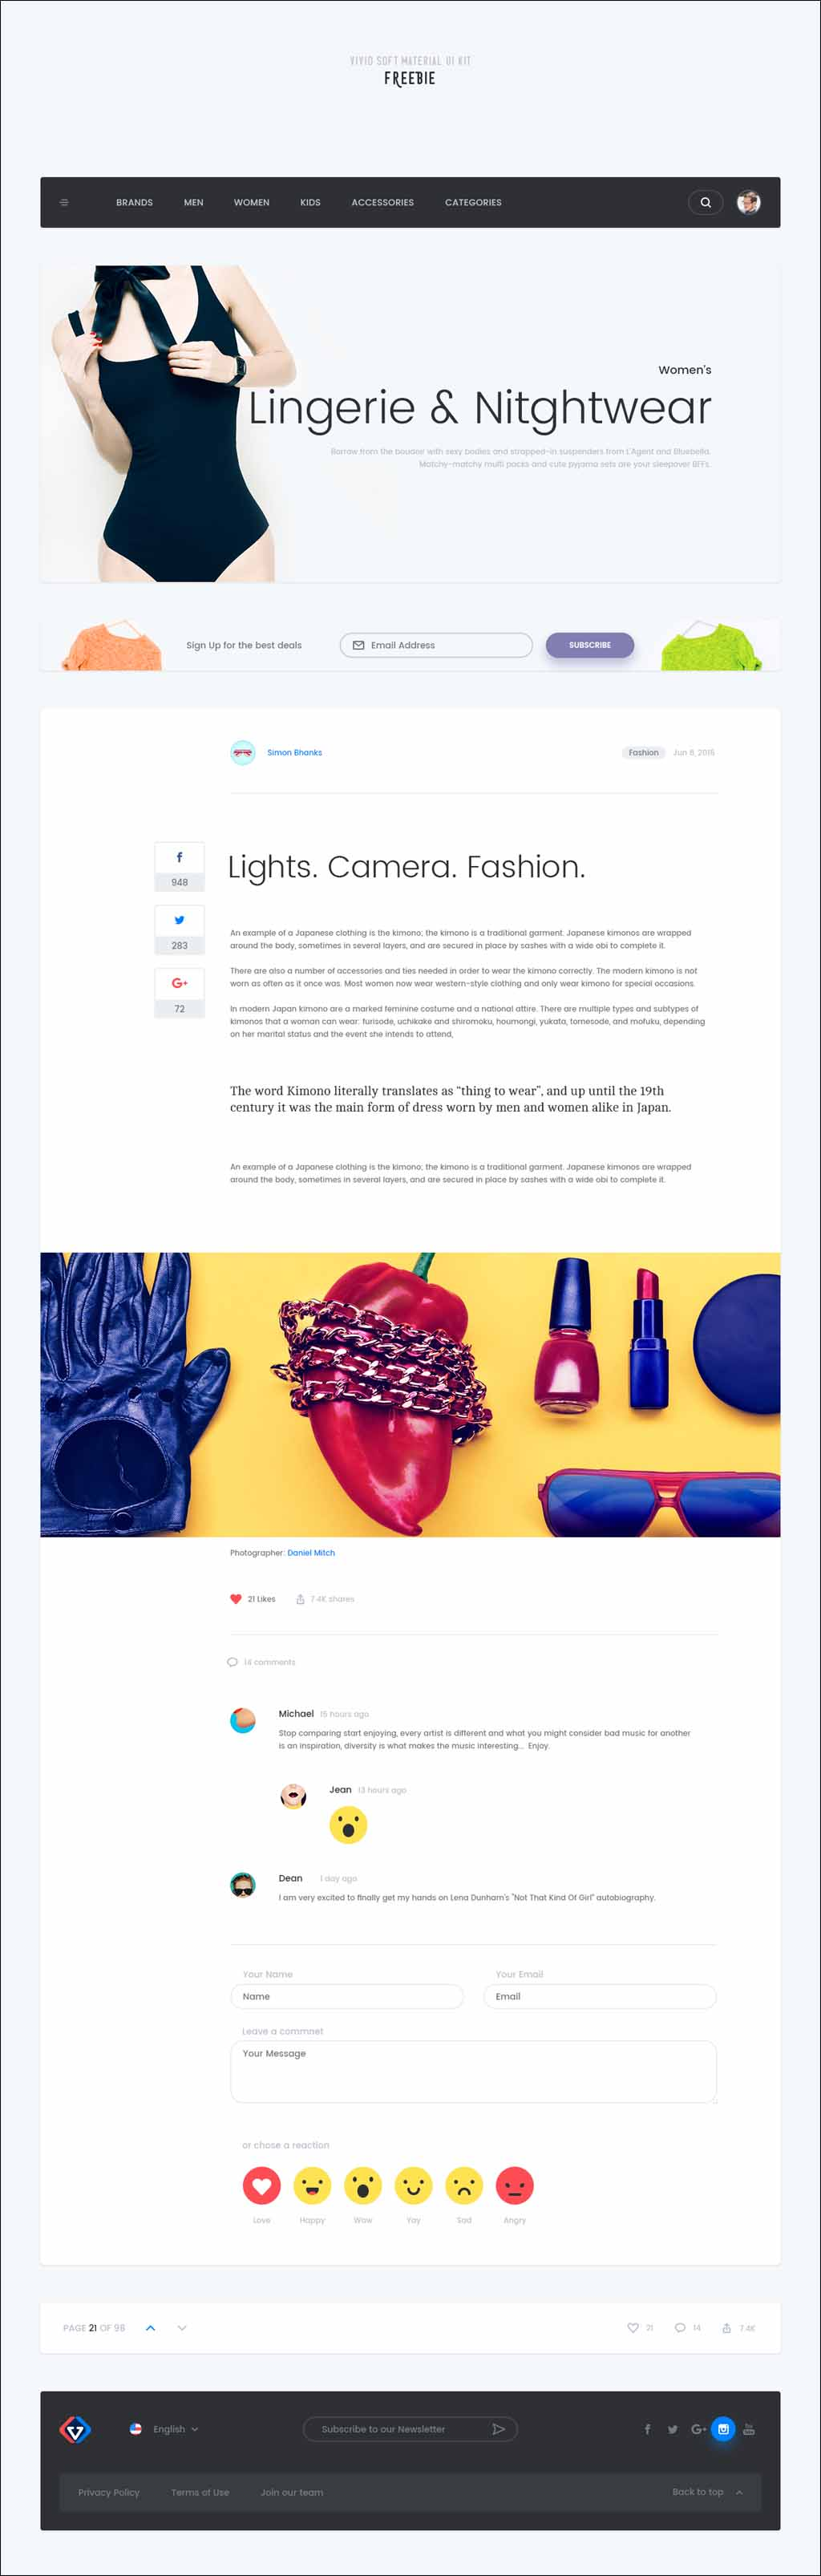 vivid soft material free psd ui kit web design etc pinterest